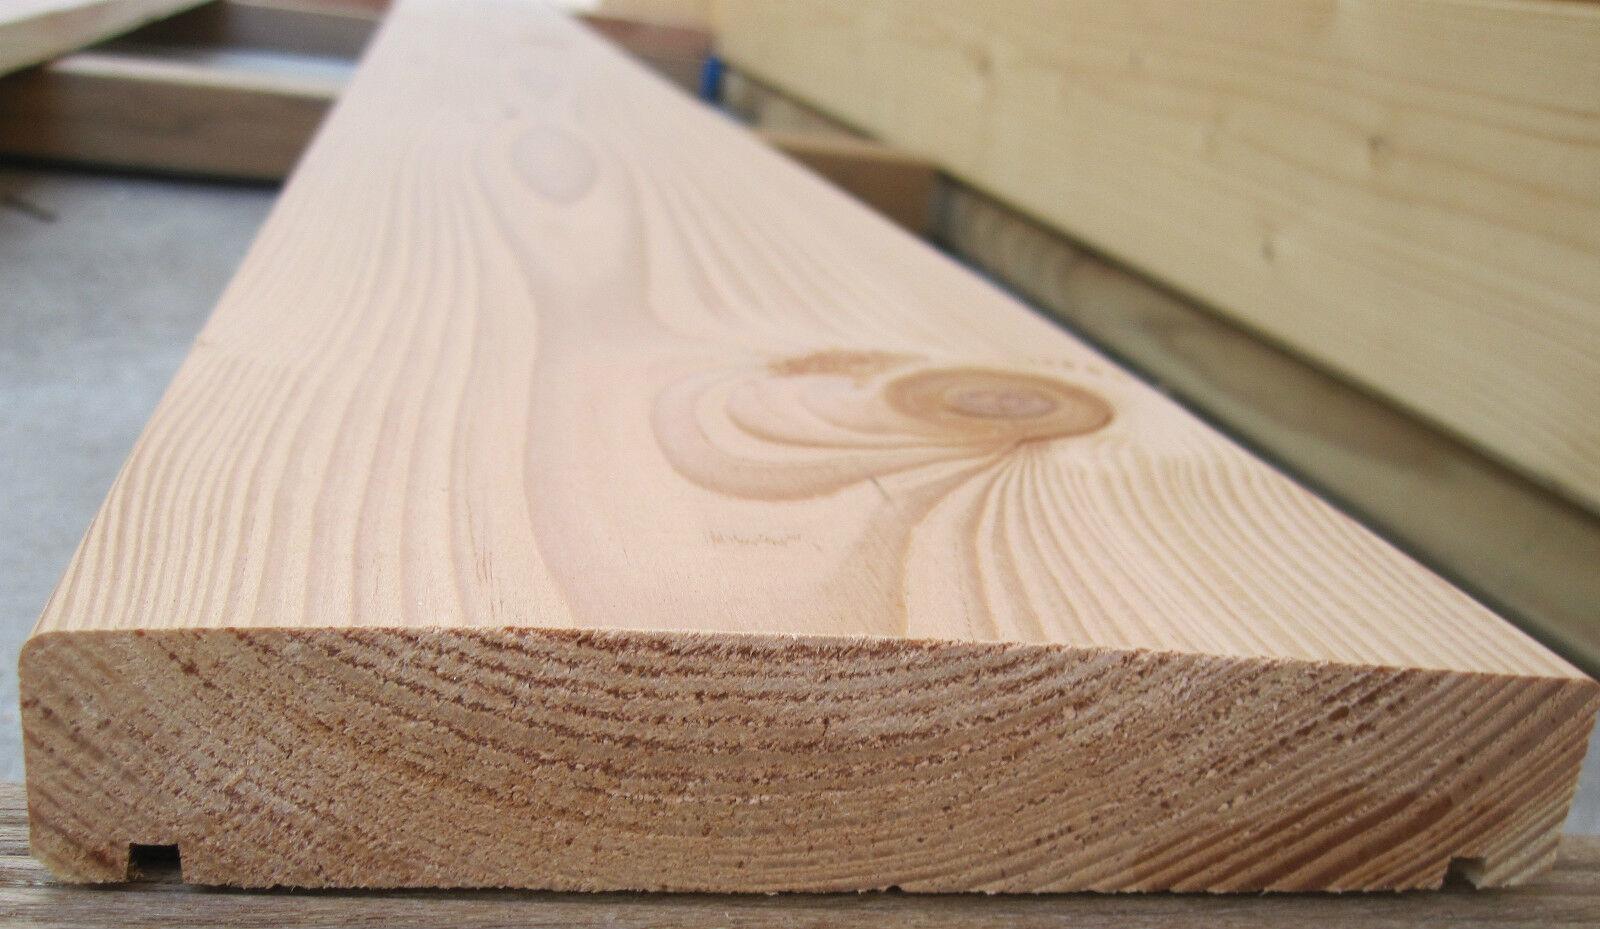 15 m² Douglasie iert Terrassen len Holz 3 m Lärche